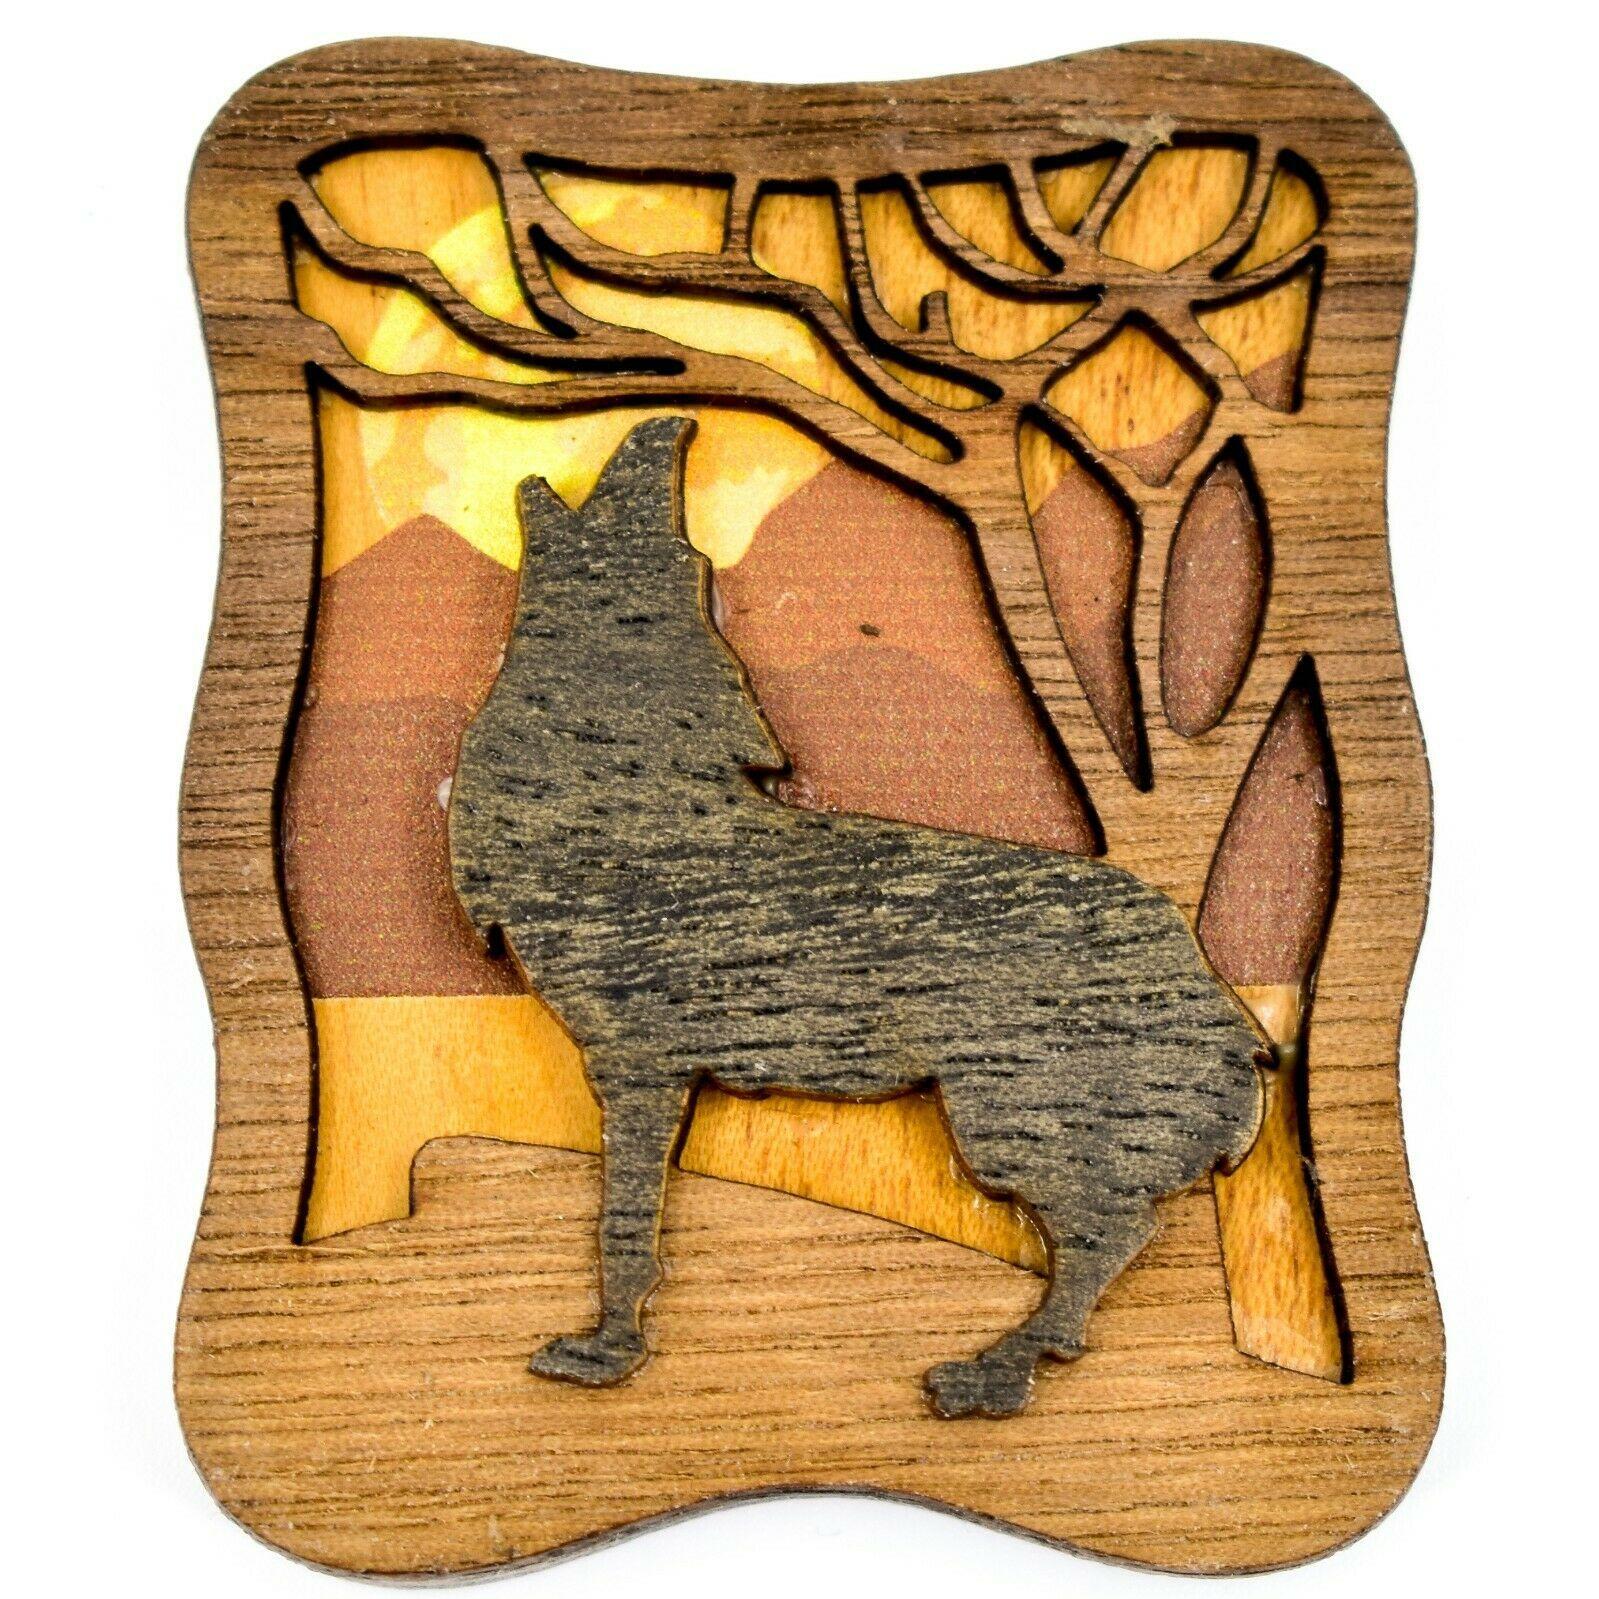 Northwoods Layered Wood Howling Wolf Habitat Rustic Refrigerator Magnet